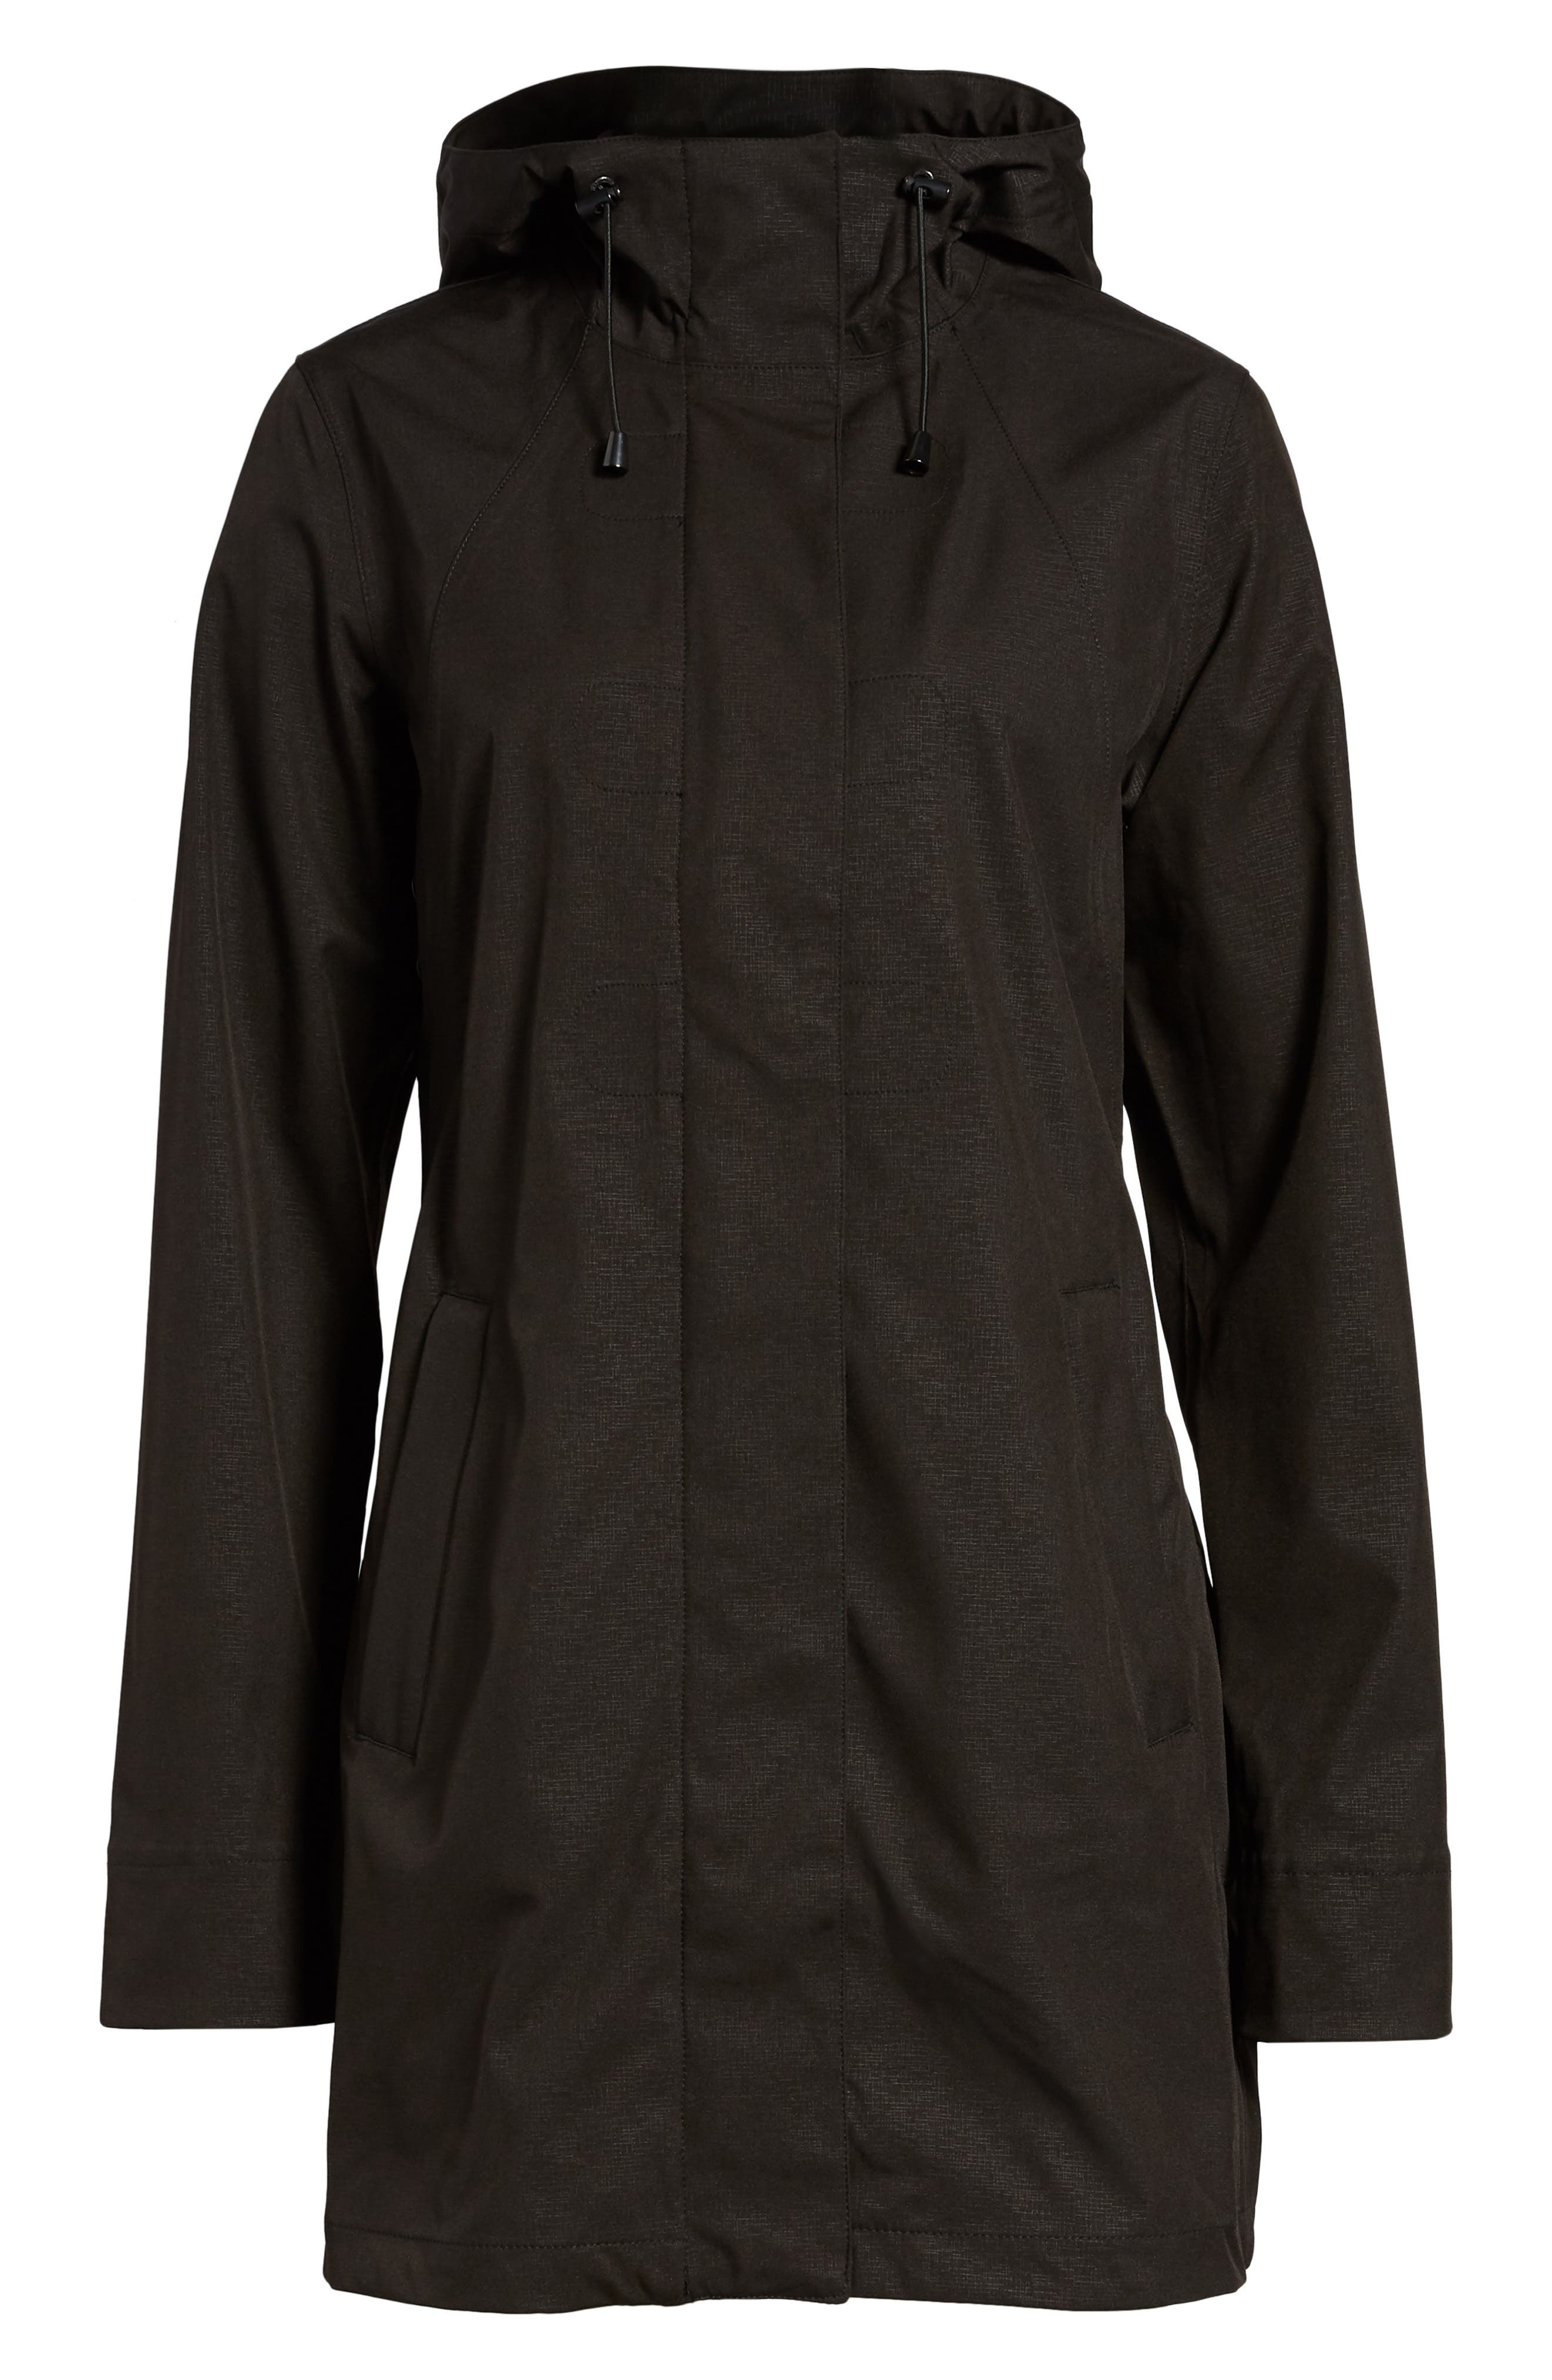 Ilse Jacobsen Soft Shell Raincoat